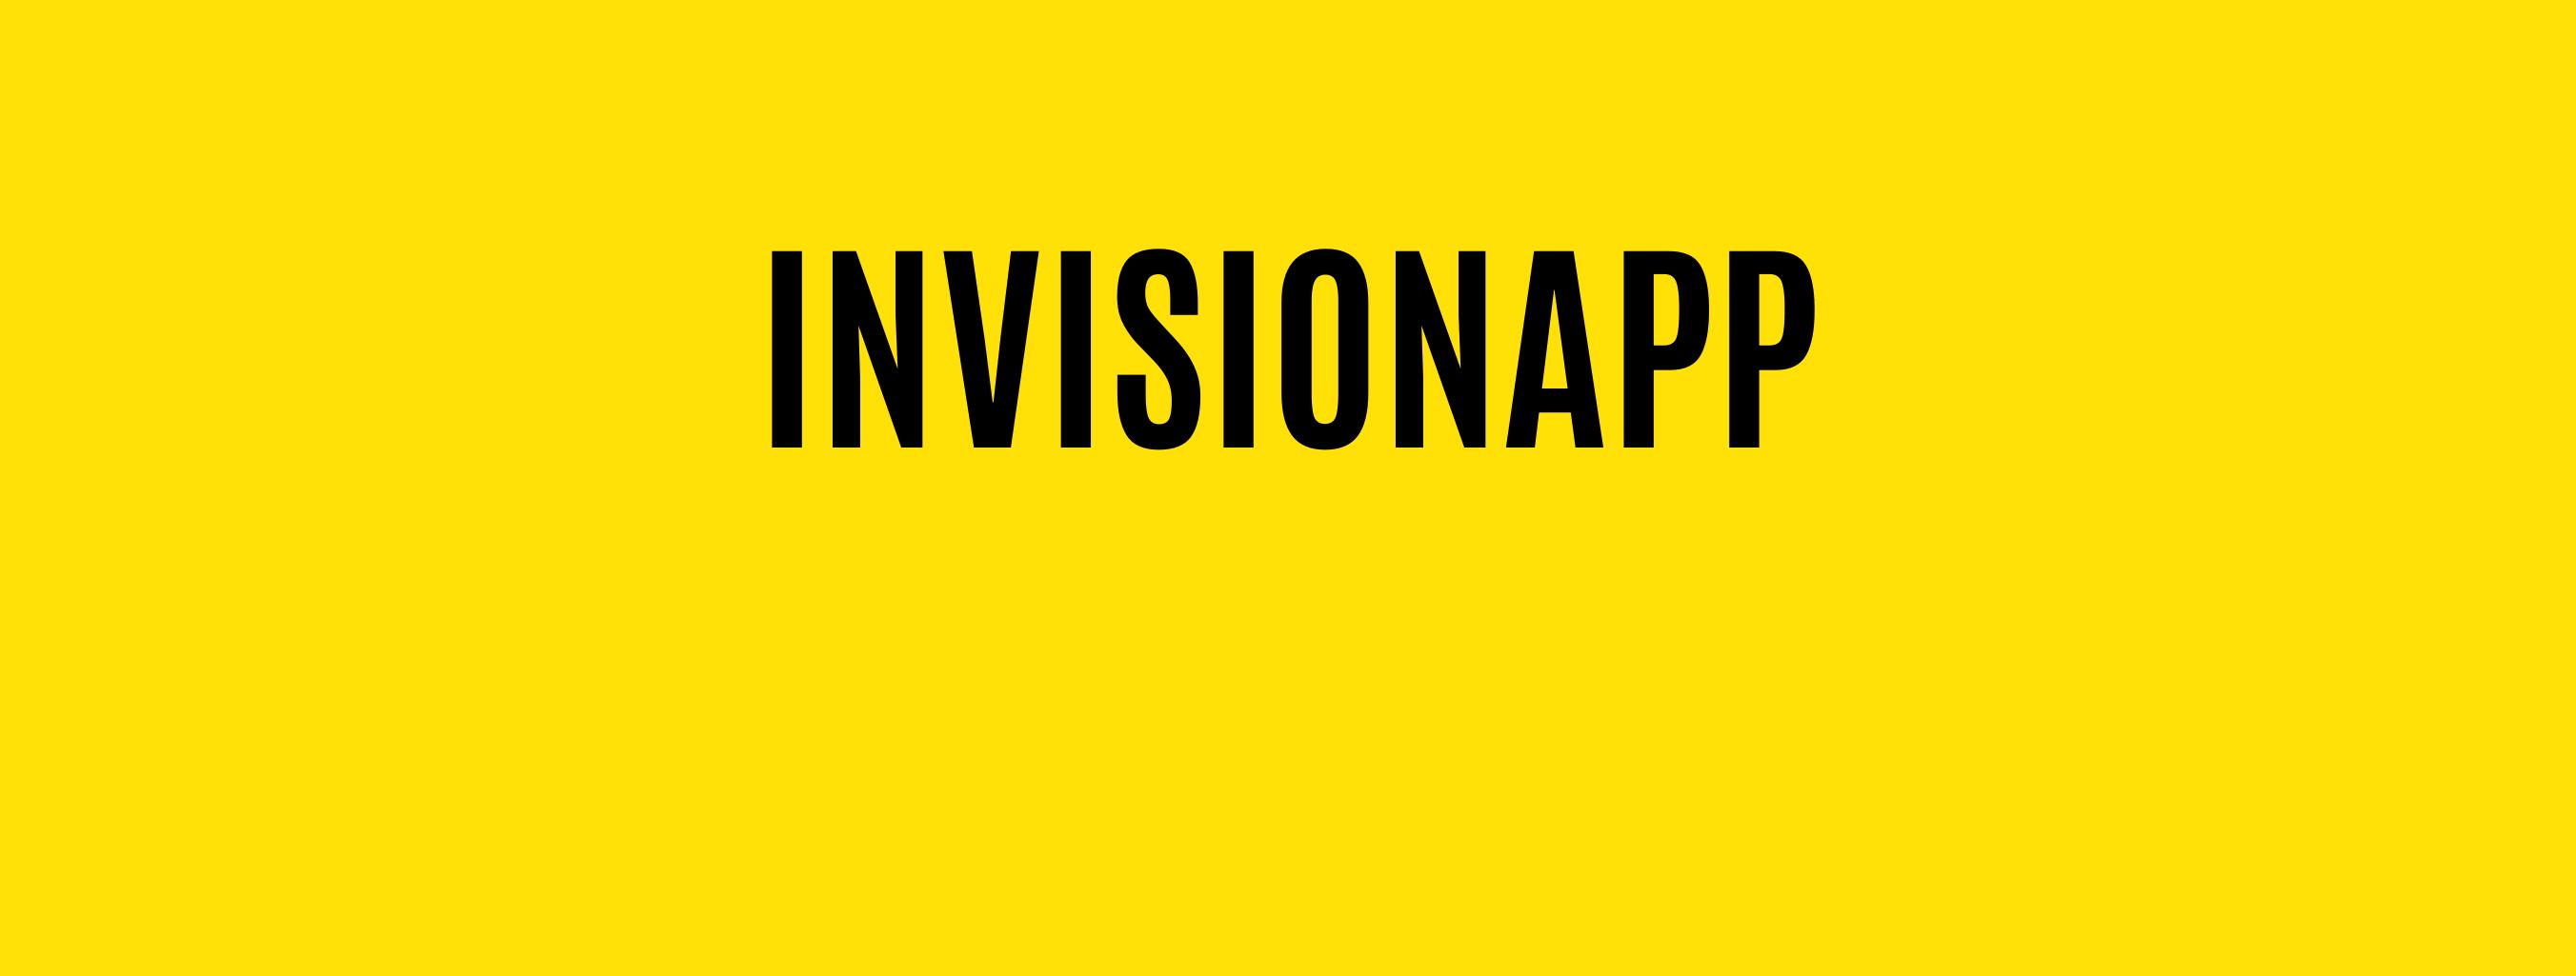 InVisionApp